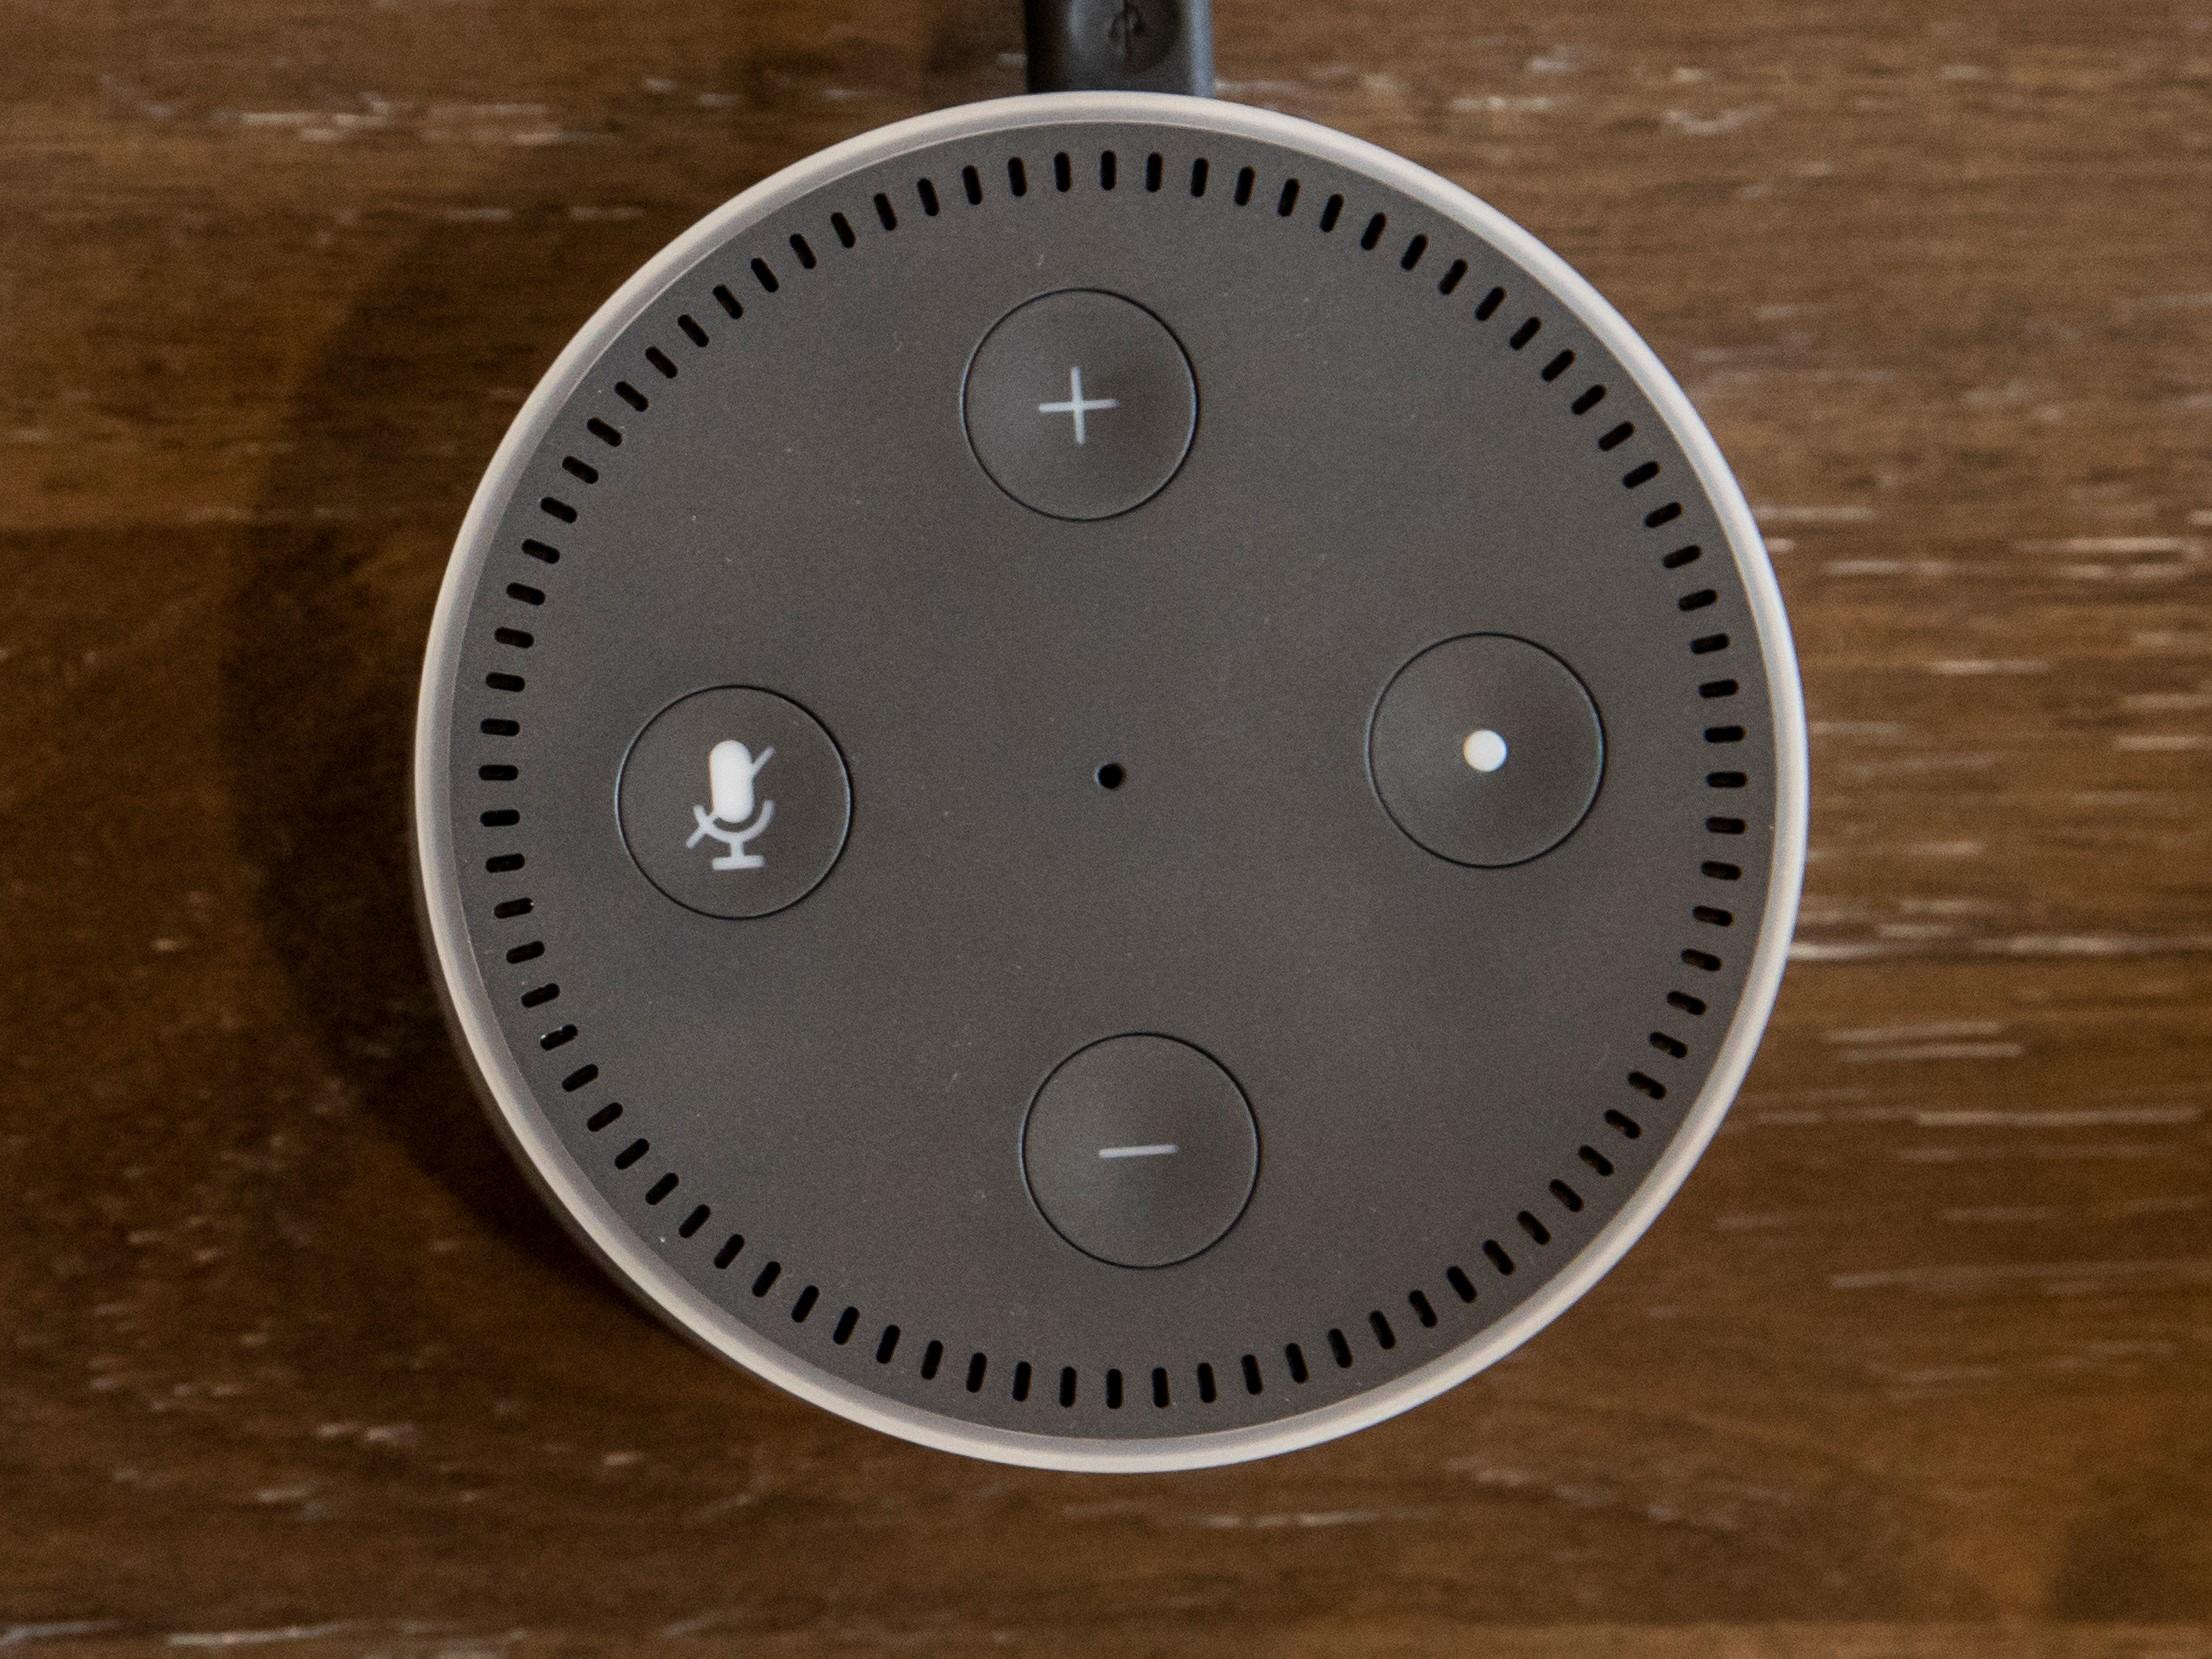 Amazon admits employees listen to Alexa conversations | The Independent